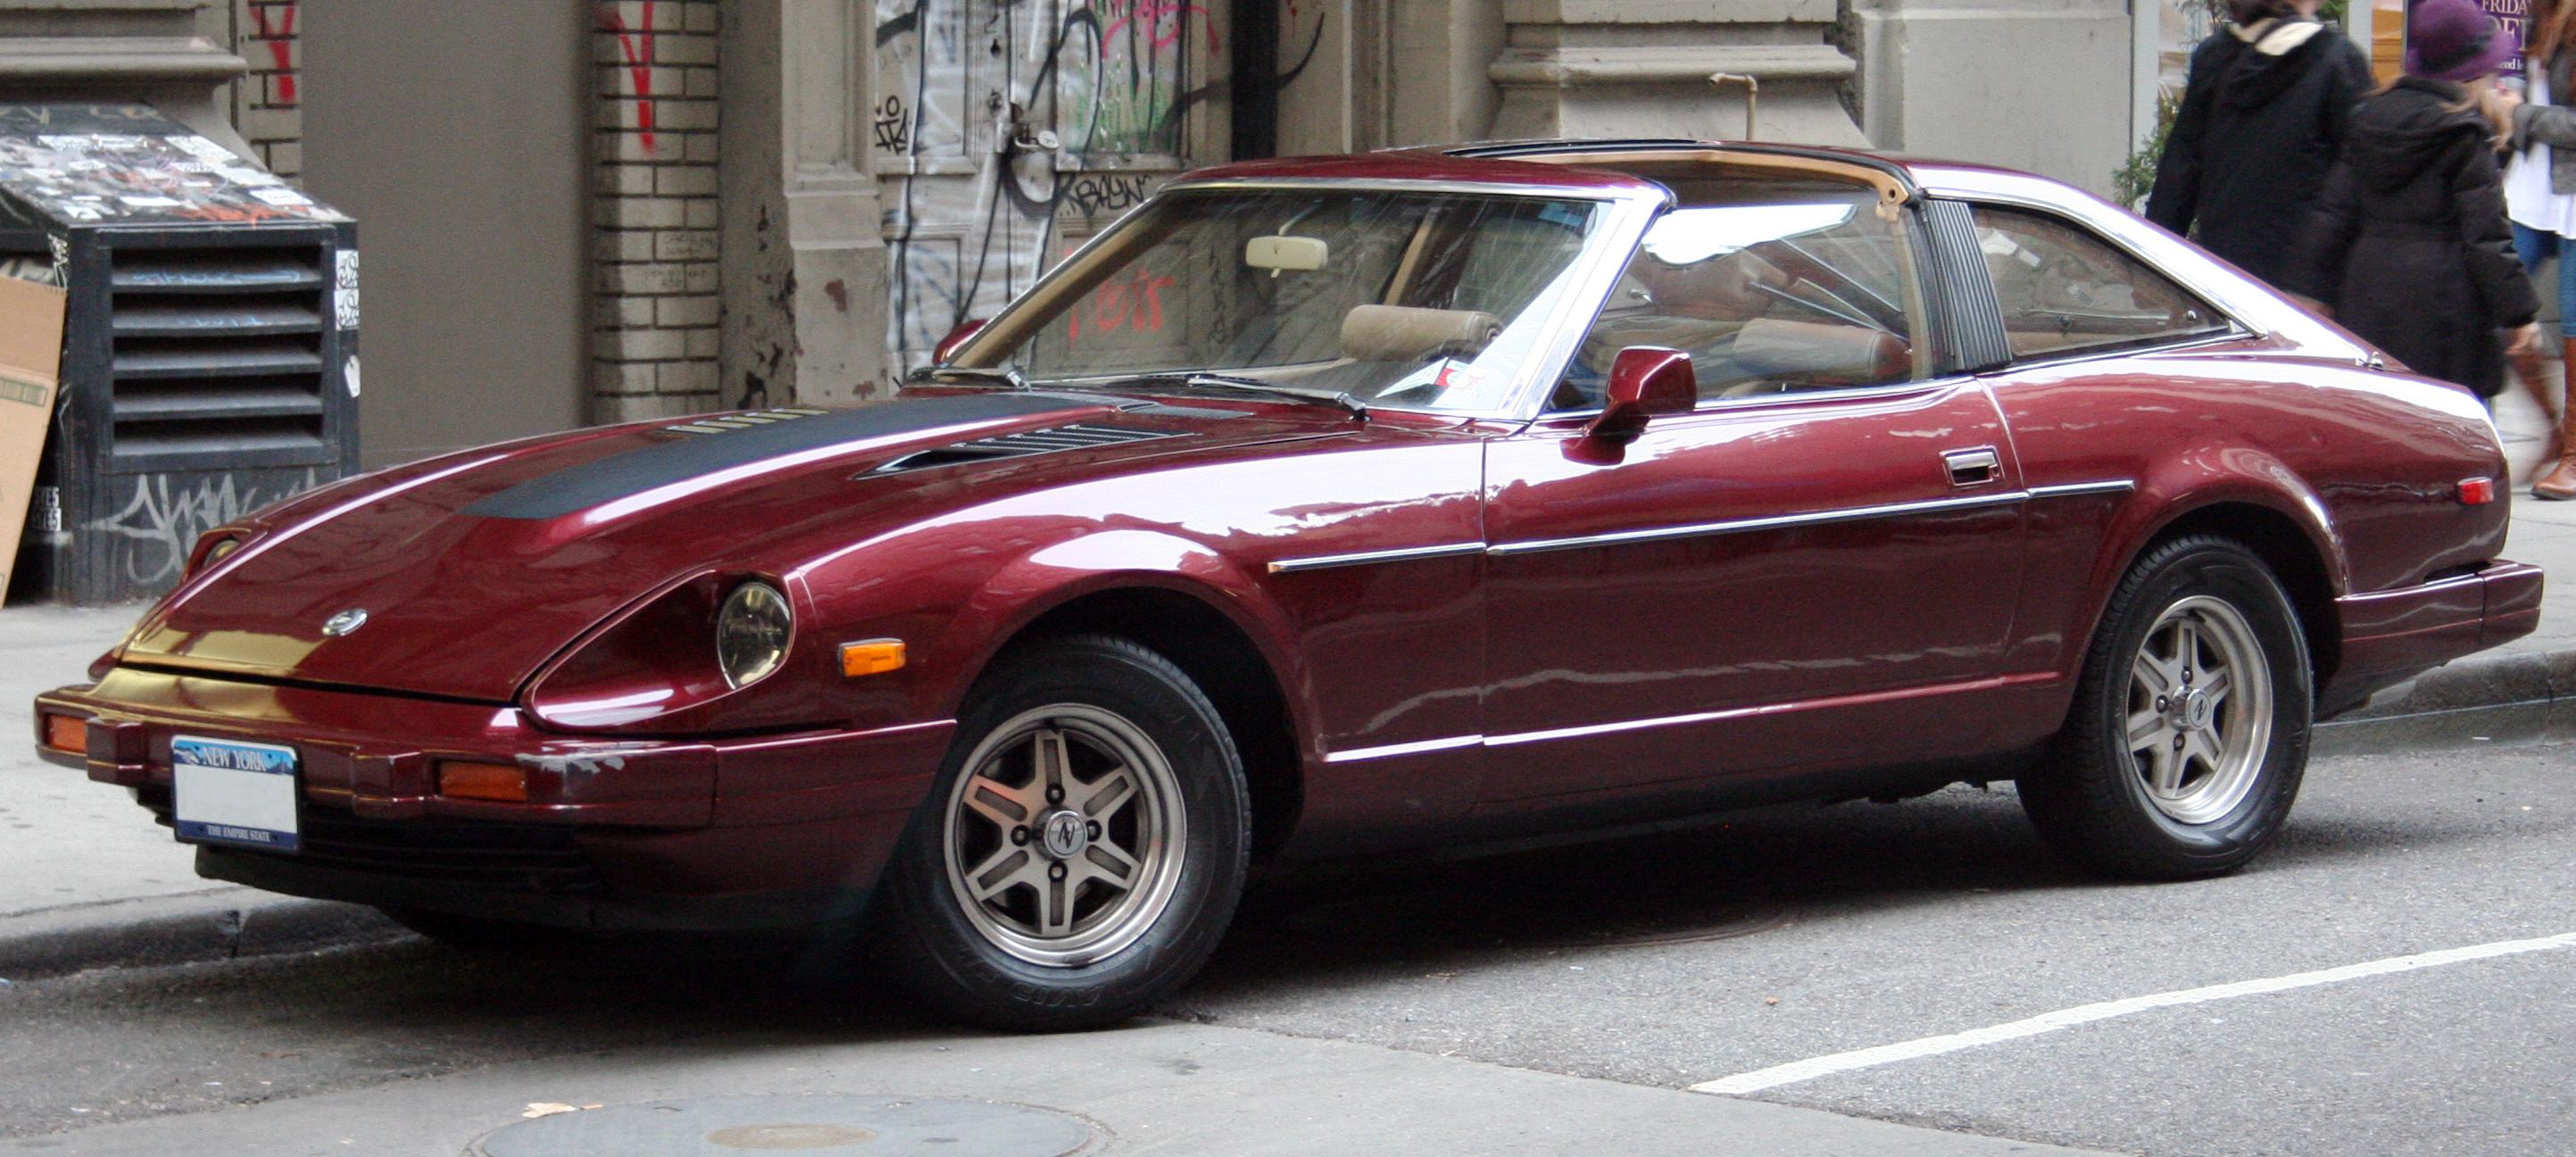 Datsun 280Zx Specs – Automobil Bildideen